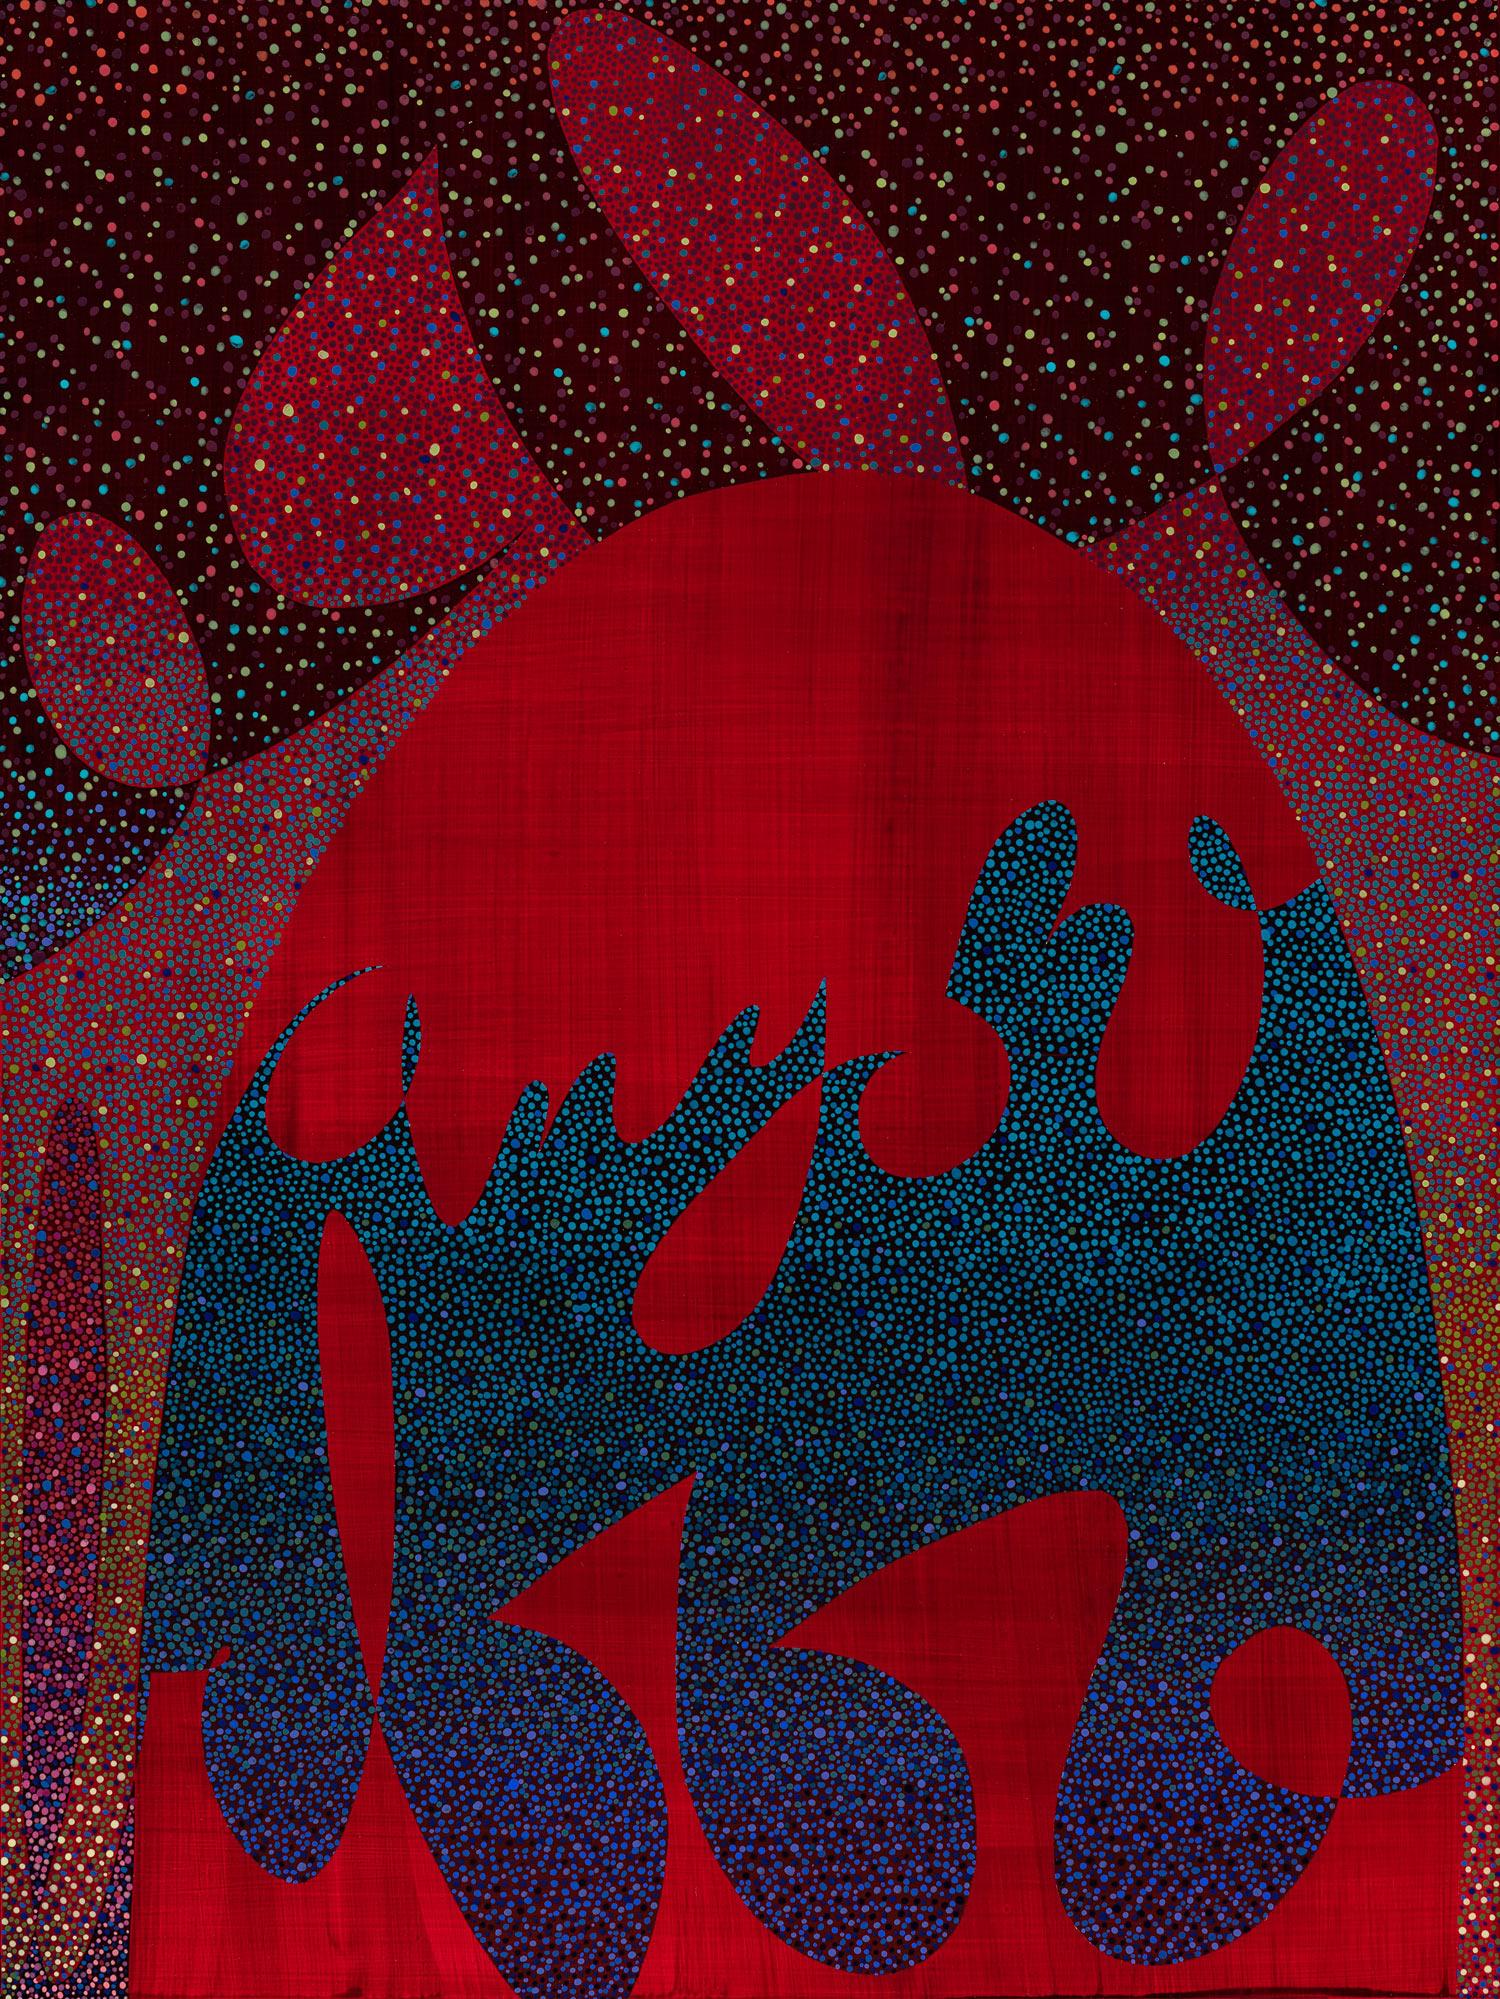 BAE , 2016  Acrylic on Panel  24h x 18w IN